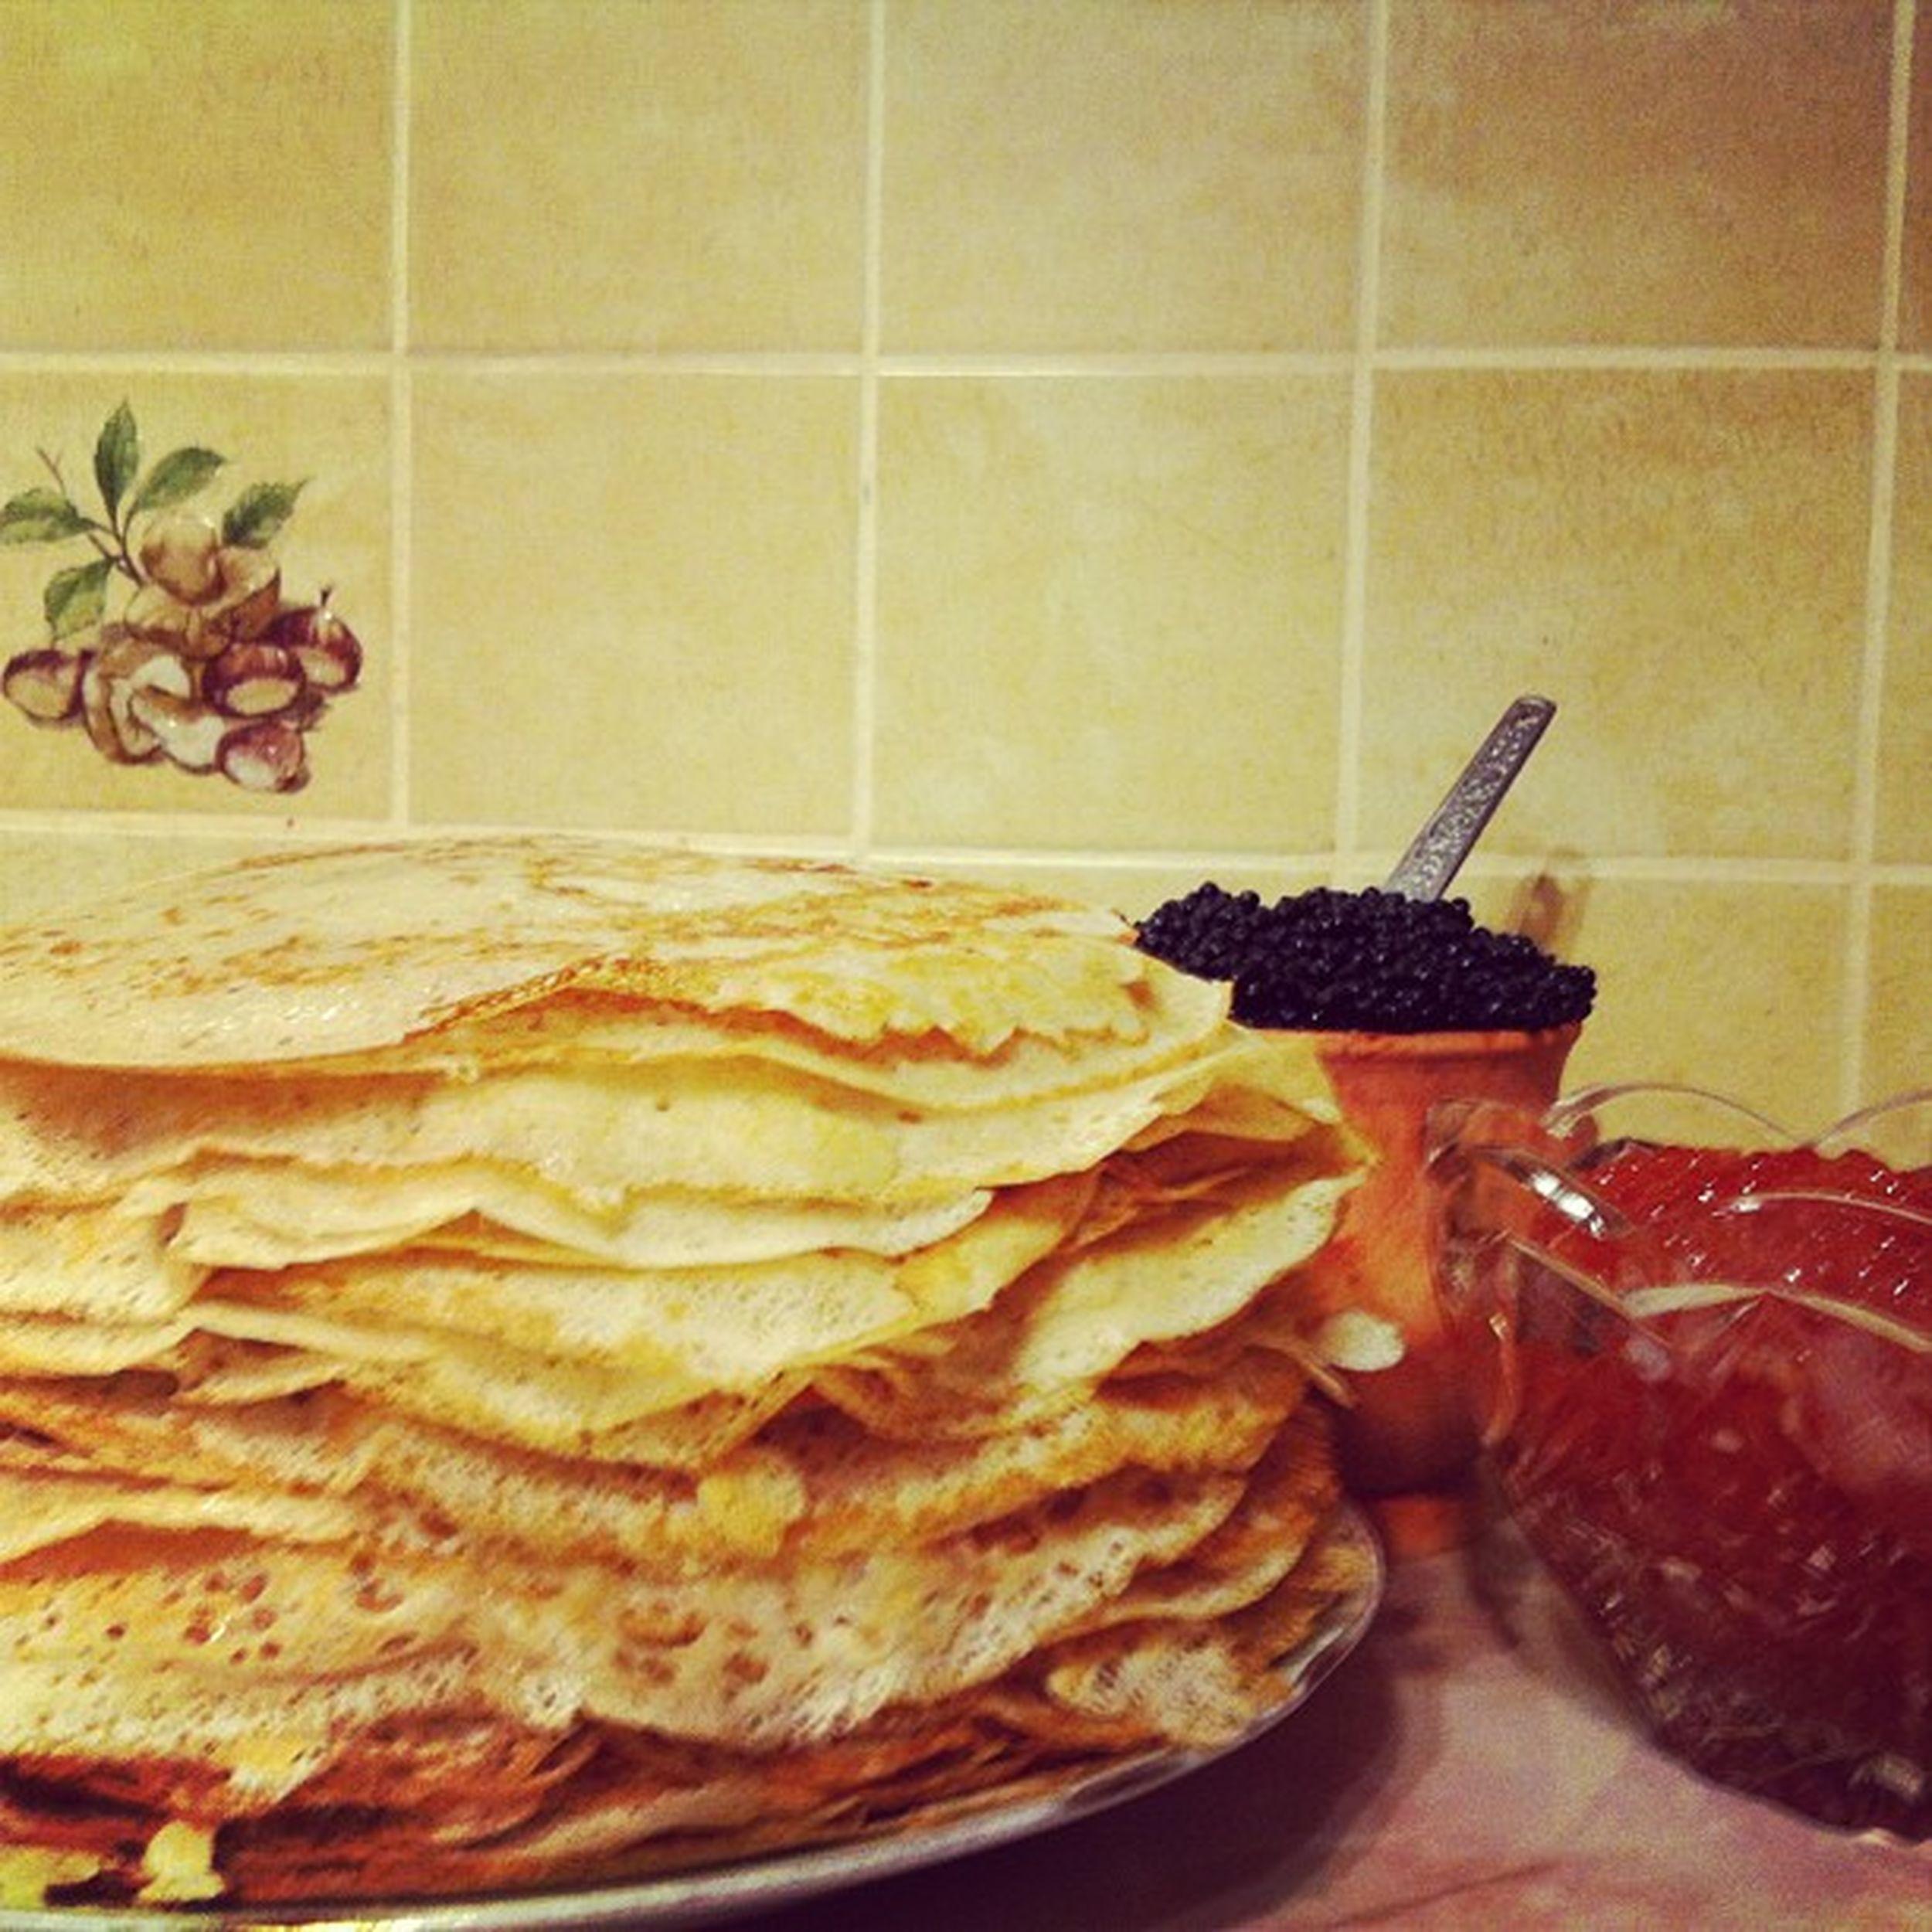 мамуля @galinka414 напекла блинов масленица Maslenitsa Festival of Pancakes Caviar Red Black